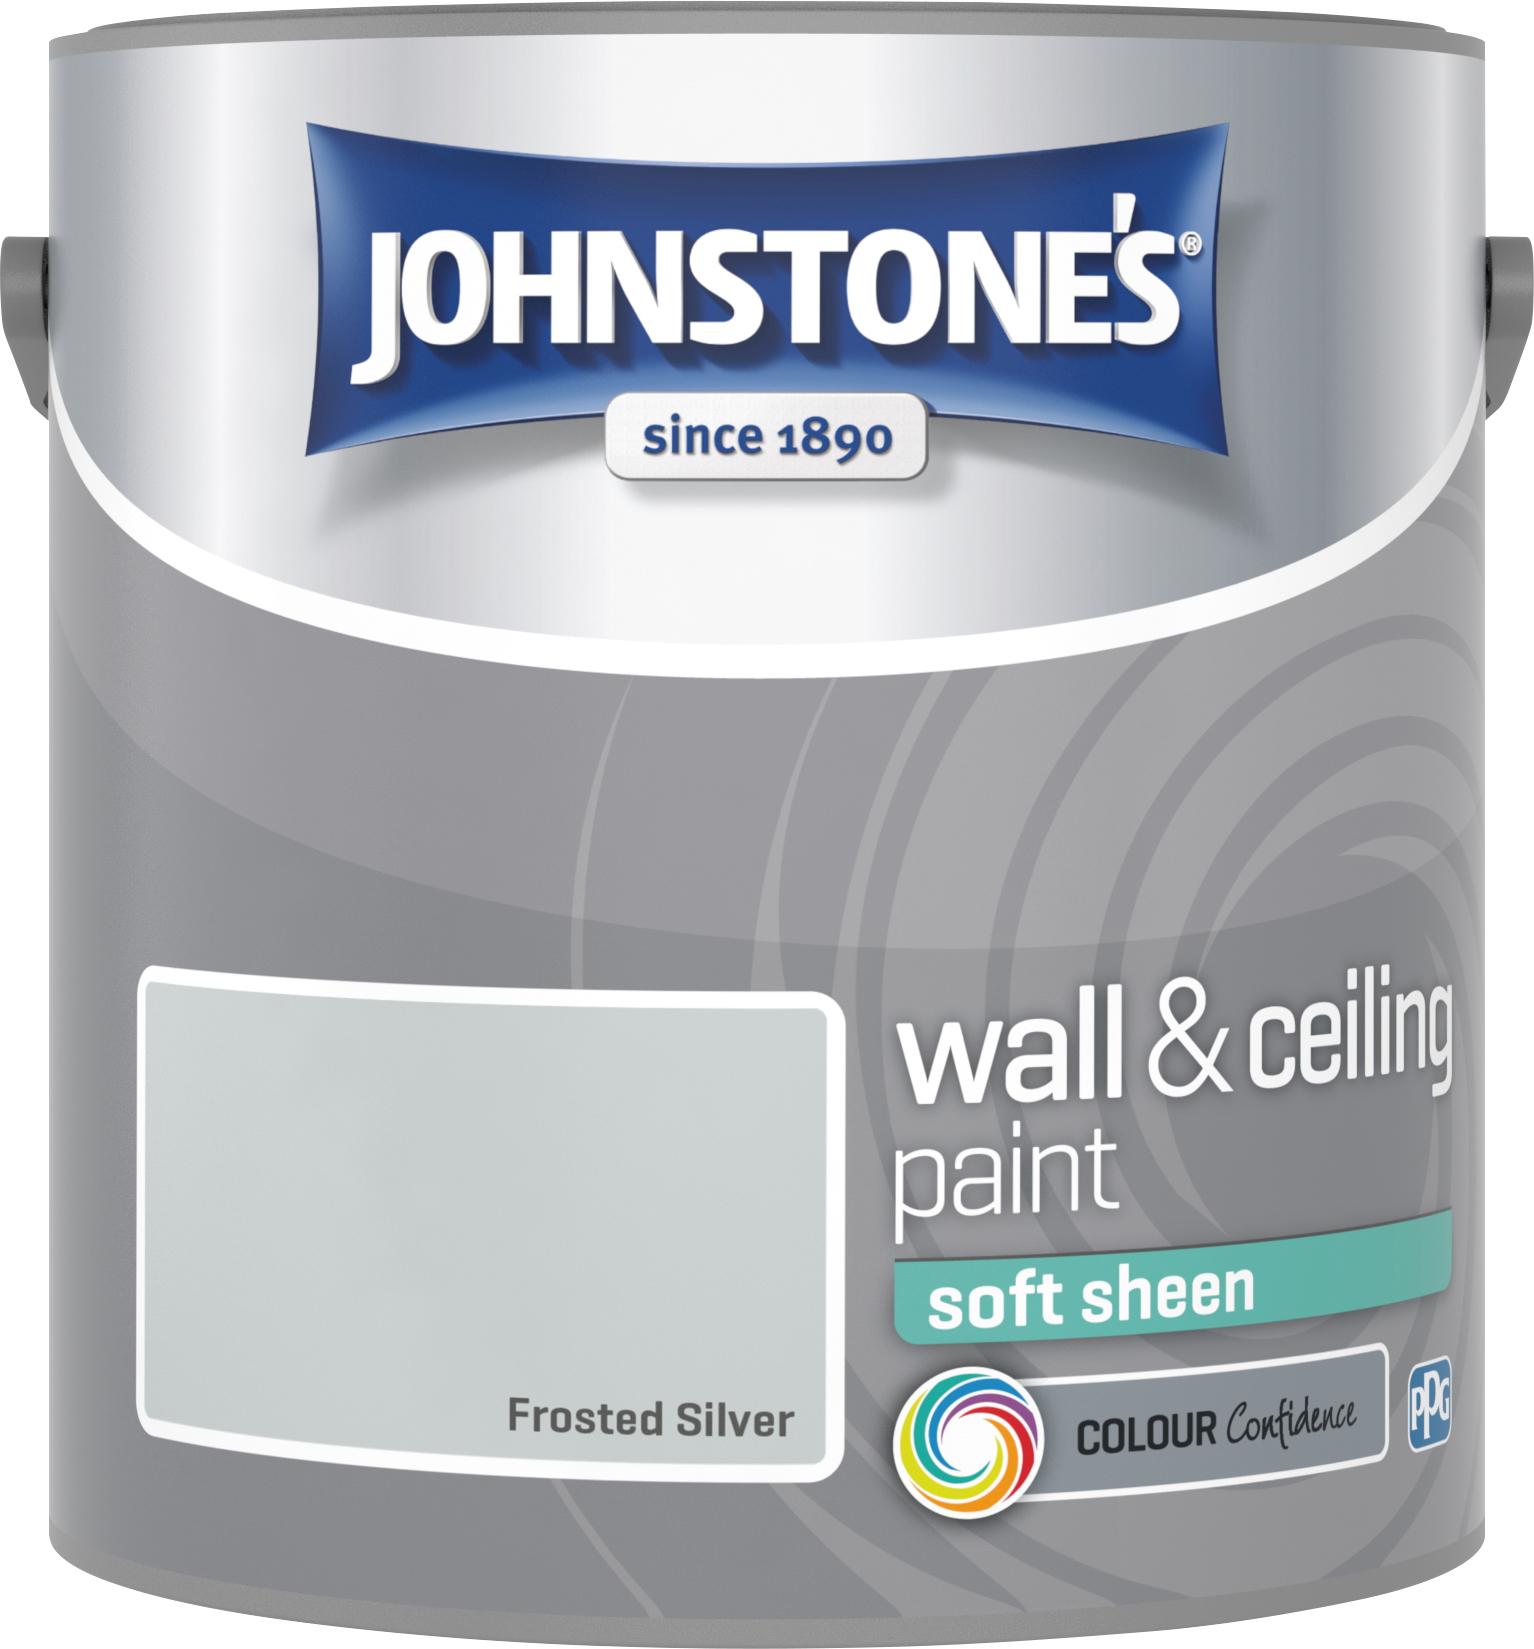 Johnstone's 2.5 Litre Soft Sheen Emulsion Paint - Frosted Sliver